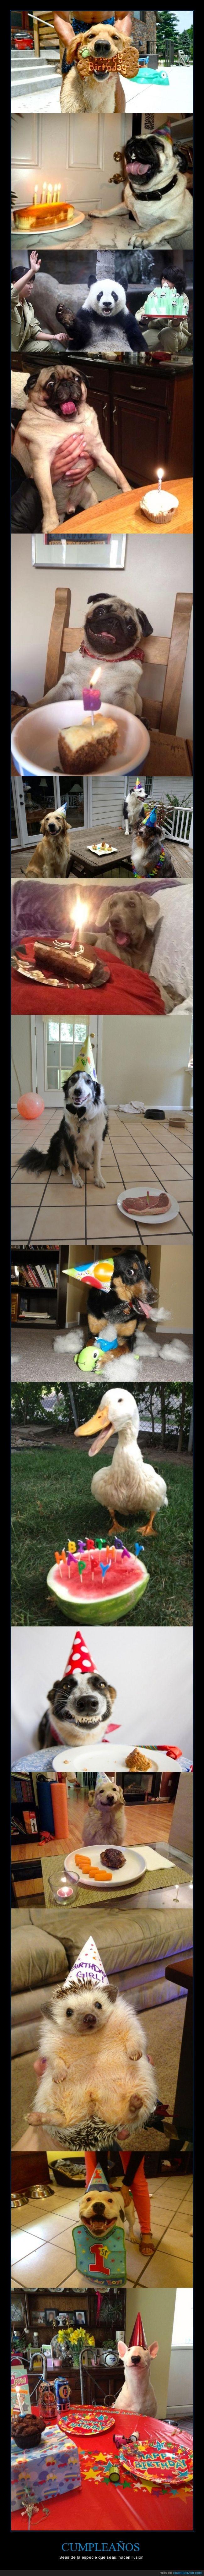 animal,cumpleaños,erizo,feliz,happy birthday,pastel,pato,perro,pug,tarta